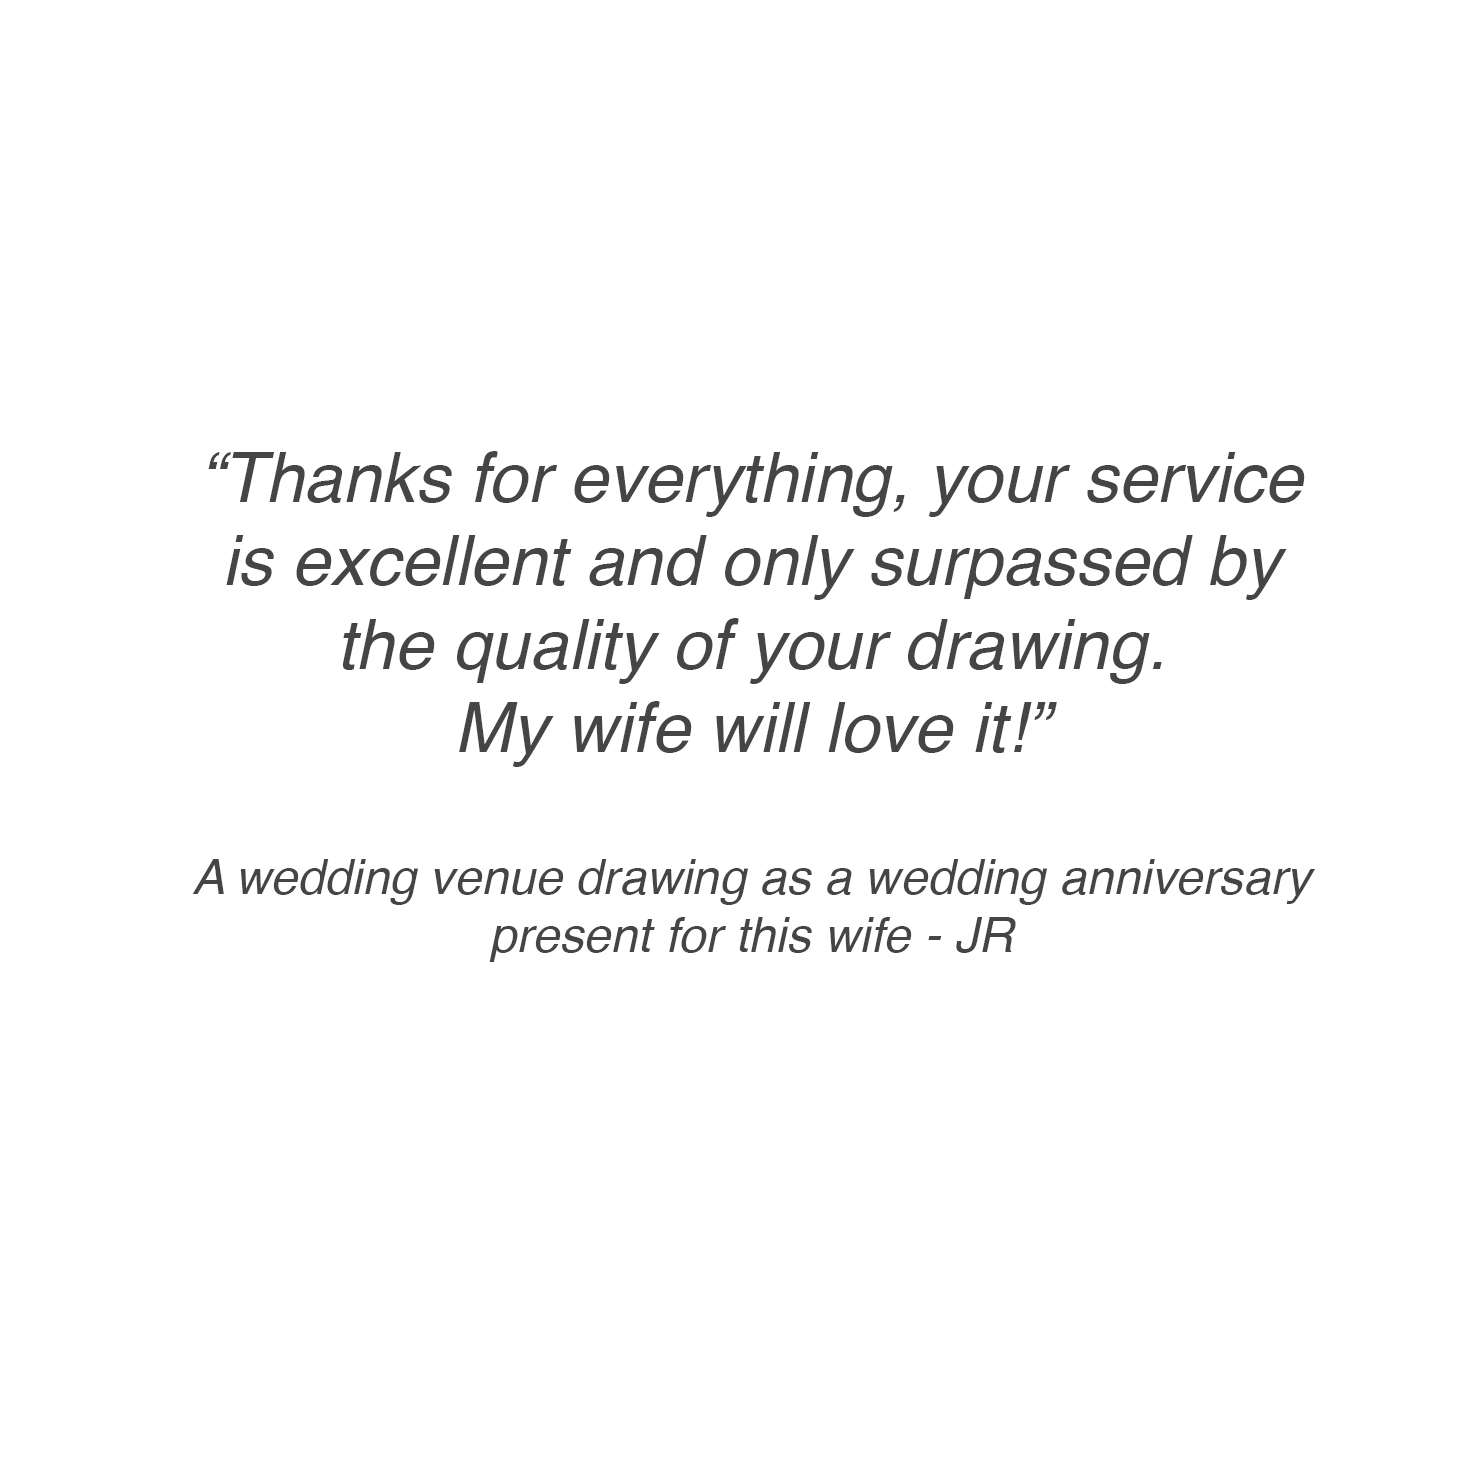 testimonial-WeddingVenue2.jpg